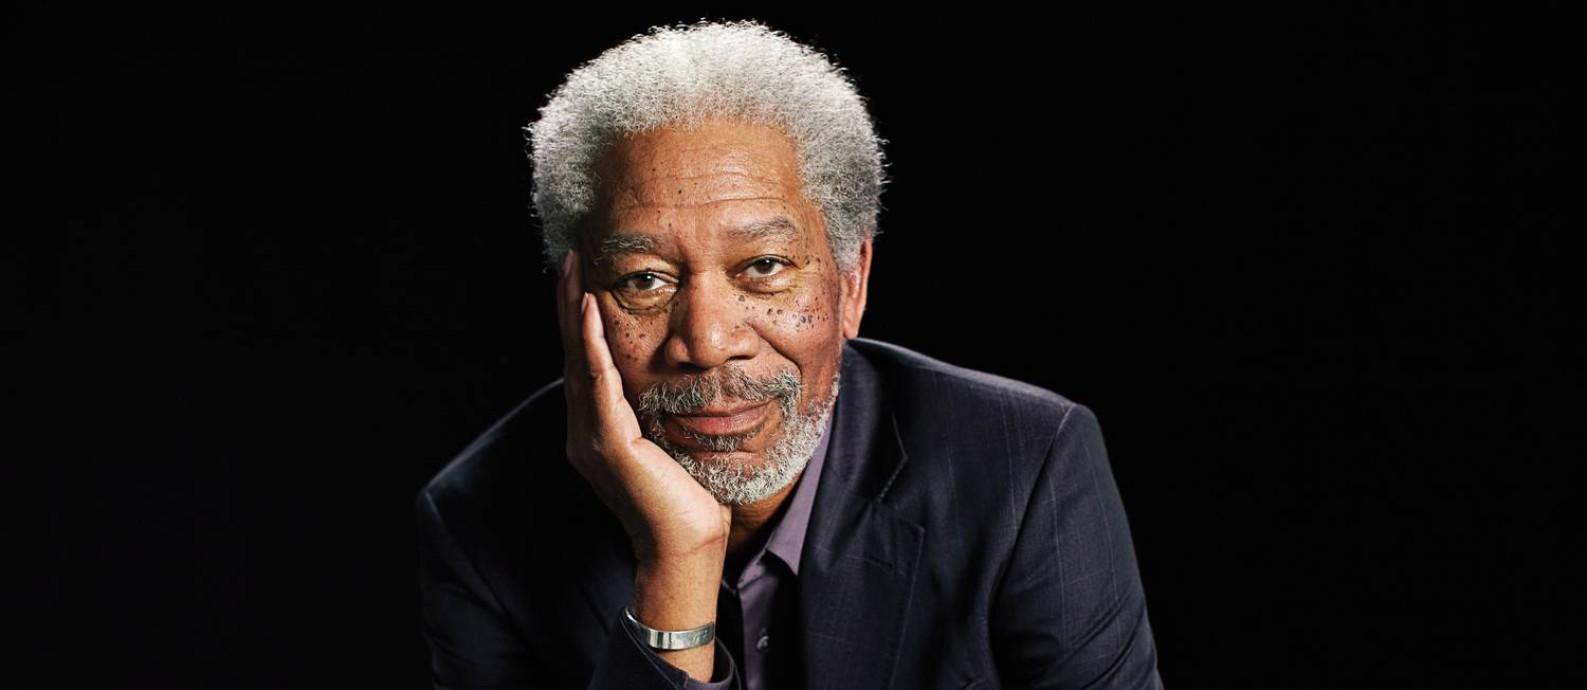 Sniff adiciona Morgan Freeman, Danny DeVito, Al Pacino e Helen Mirren no elenco